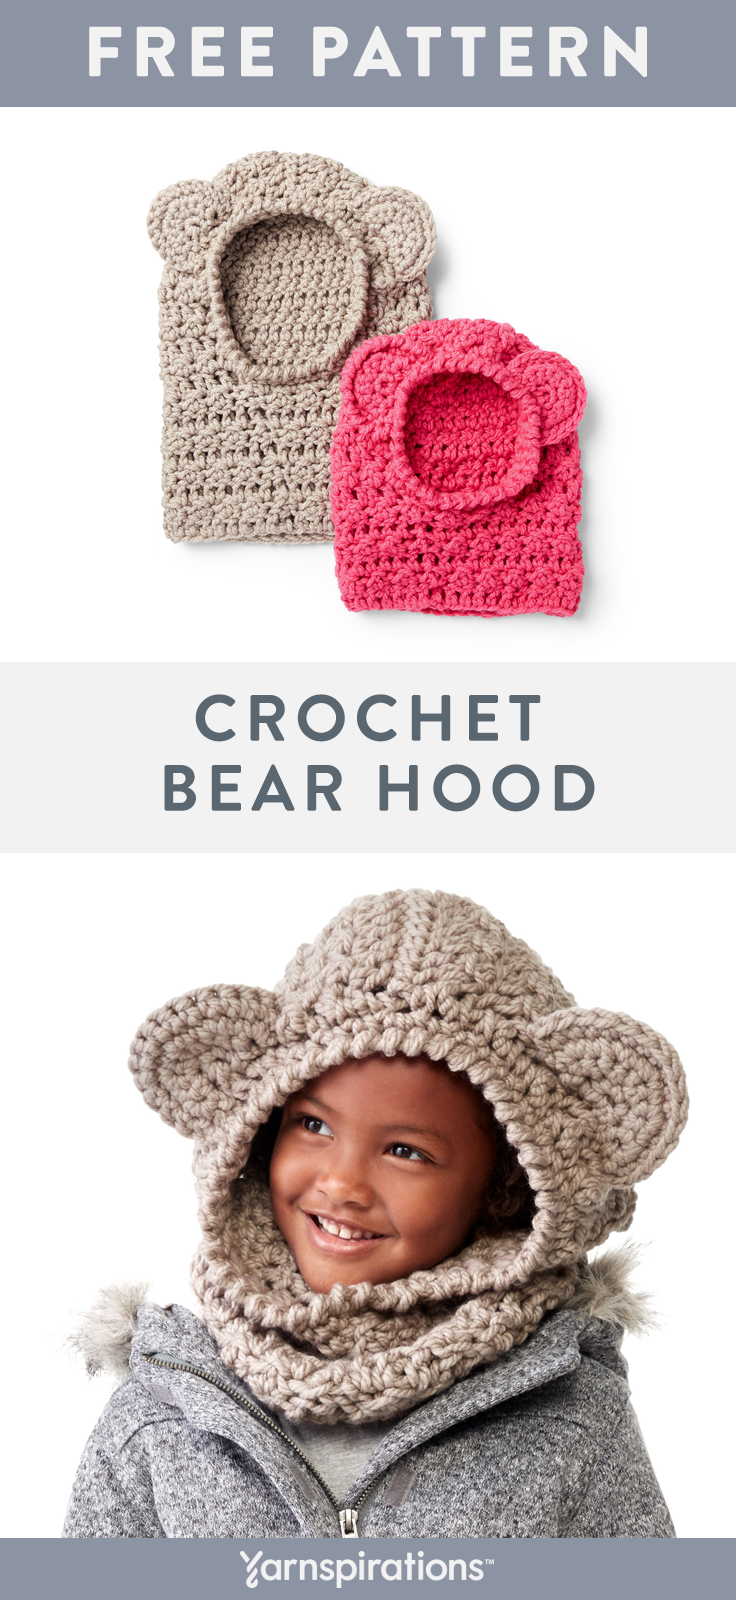 Free Crochet Bear Hood Pattern | Gift them a cute and cozy crochet bear hood made with warm and bulky Bernat Softee Chunky yarn. #yarnspirations #bernatsofteechunky #crochetbearhood #crochet #freecrochetpatterns #crochetbear